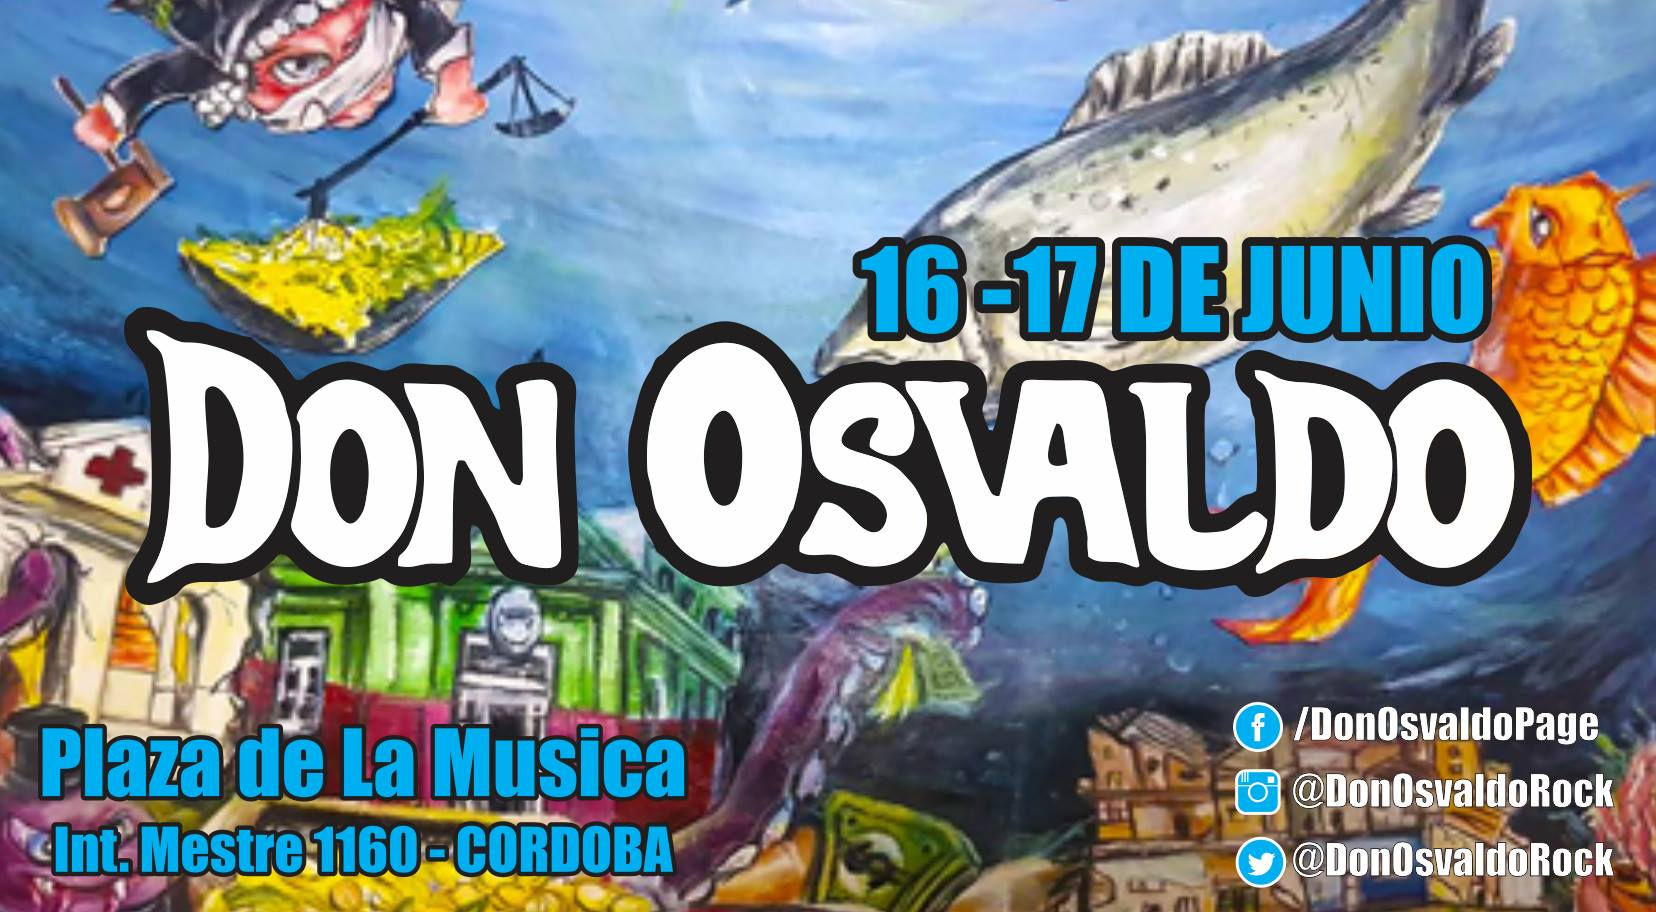 don-osvaldo-cordoba-19-junio